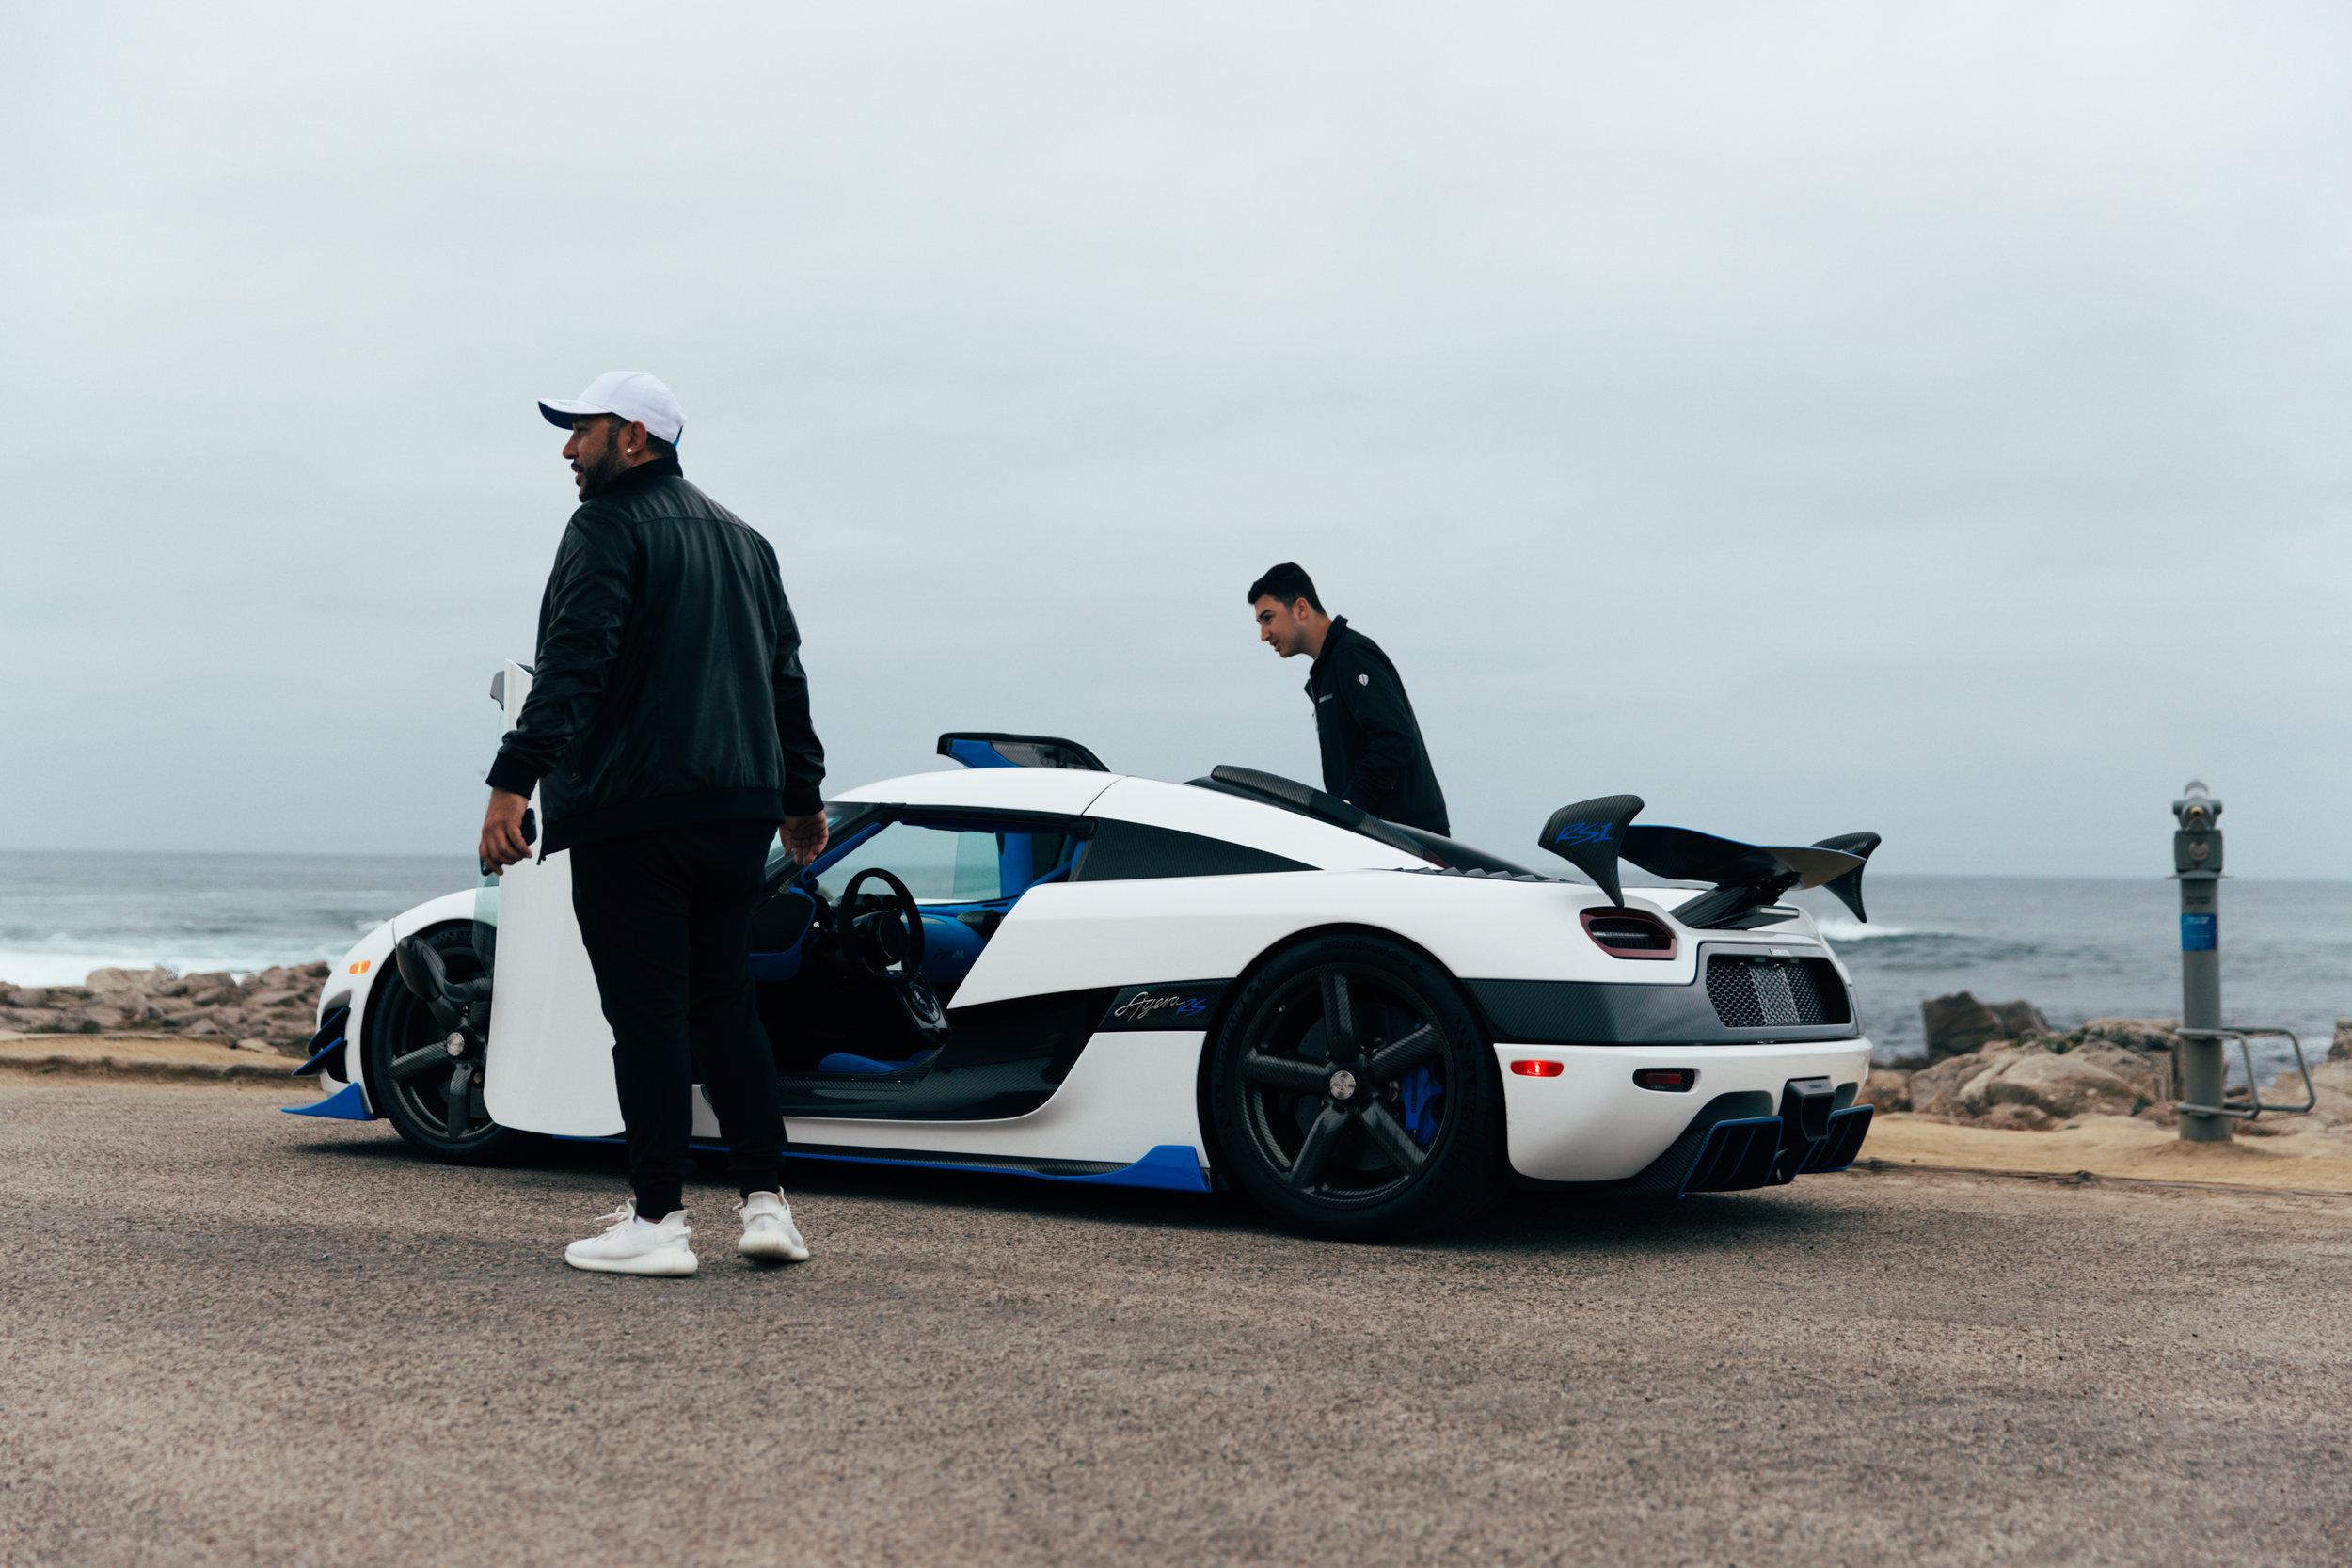 Stay_Driven_Monterey_Car_Week_Whitesse_Koenigsegg-36.jpg